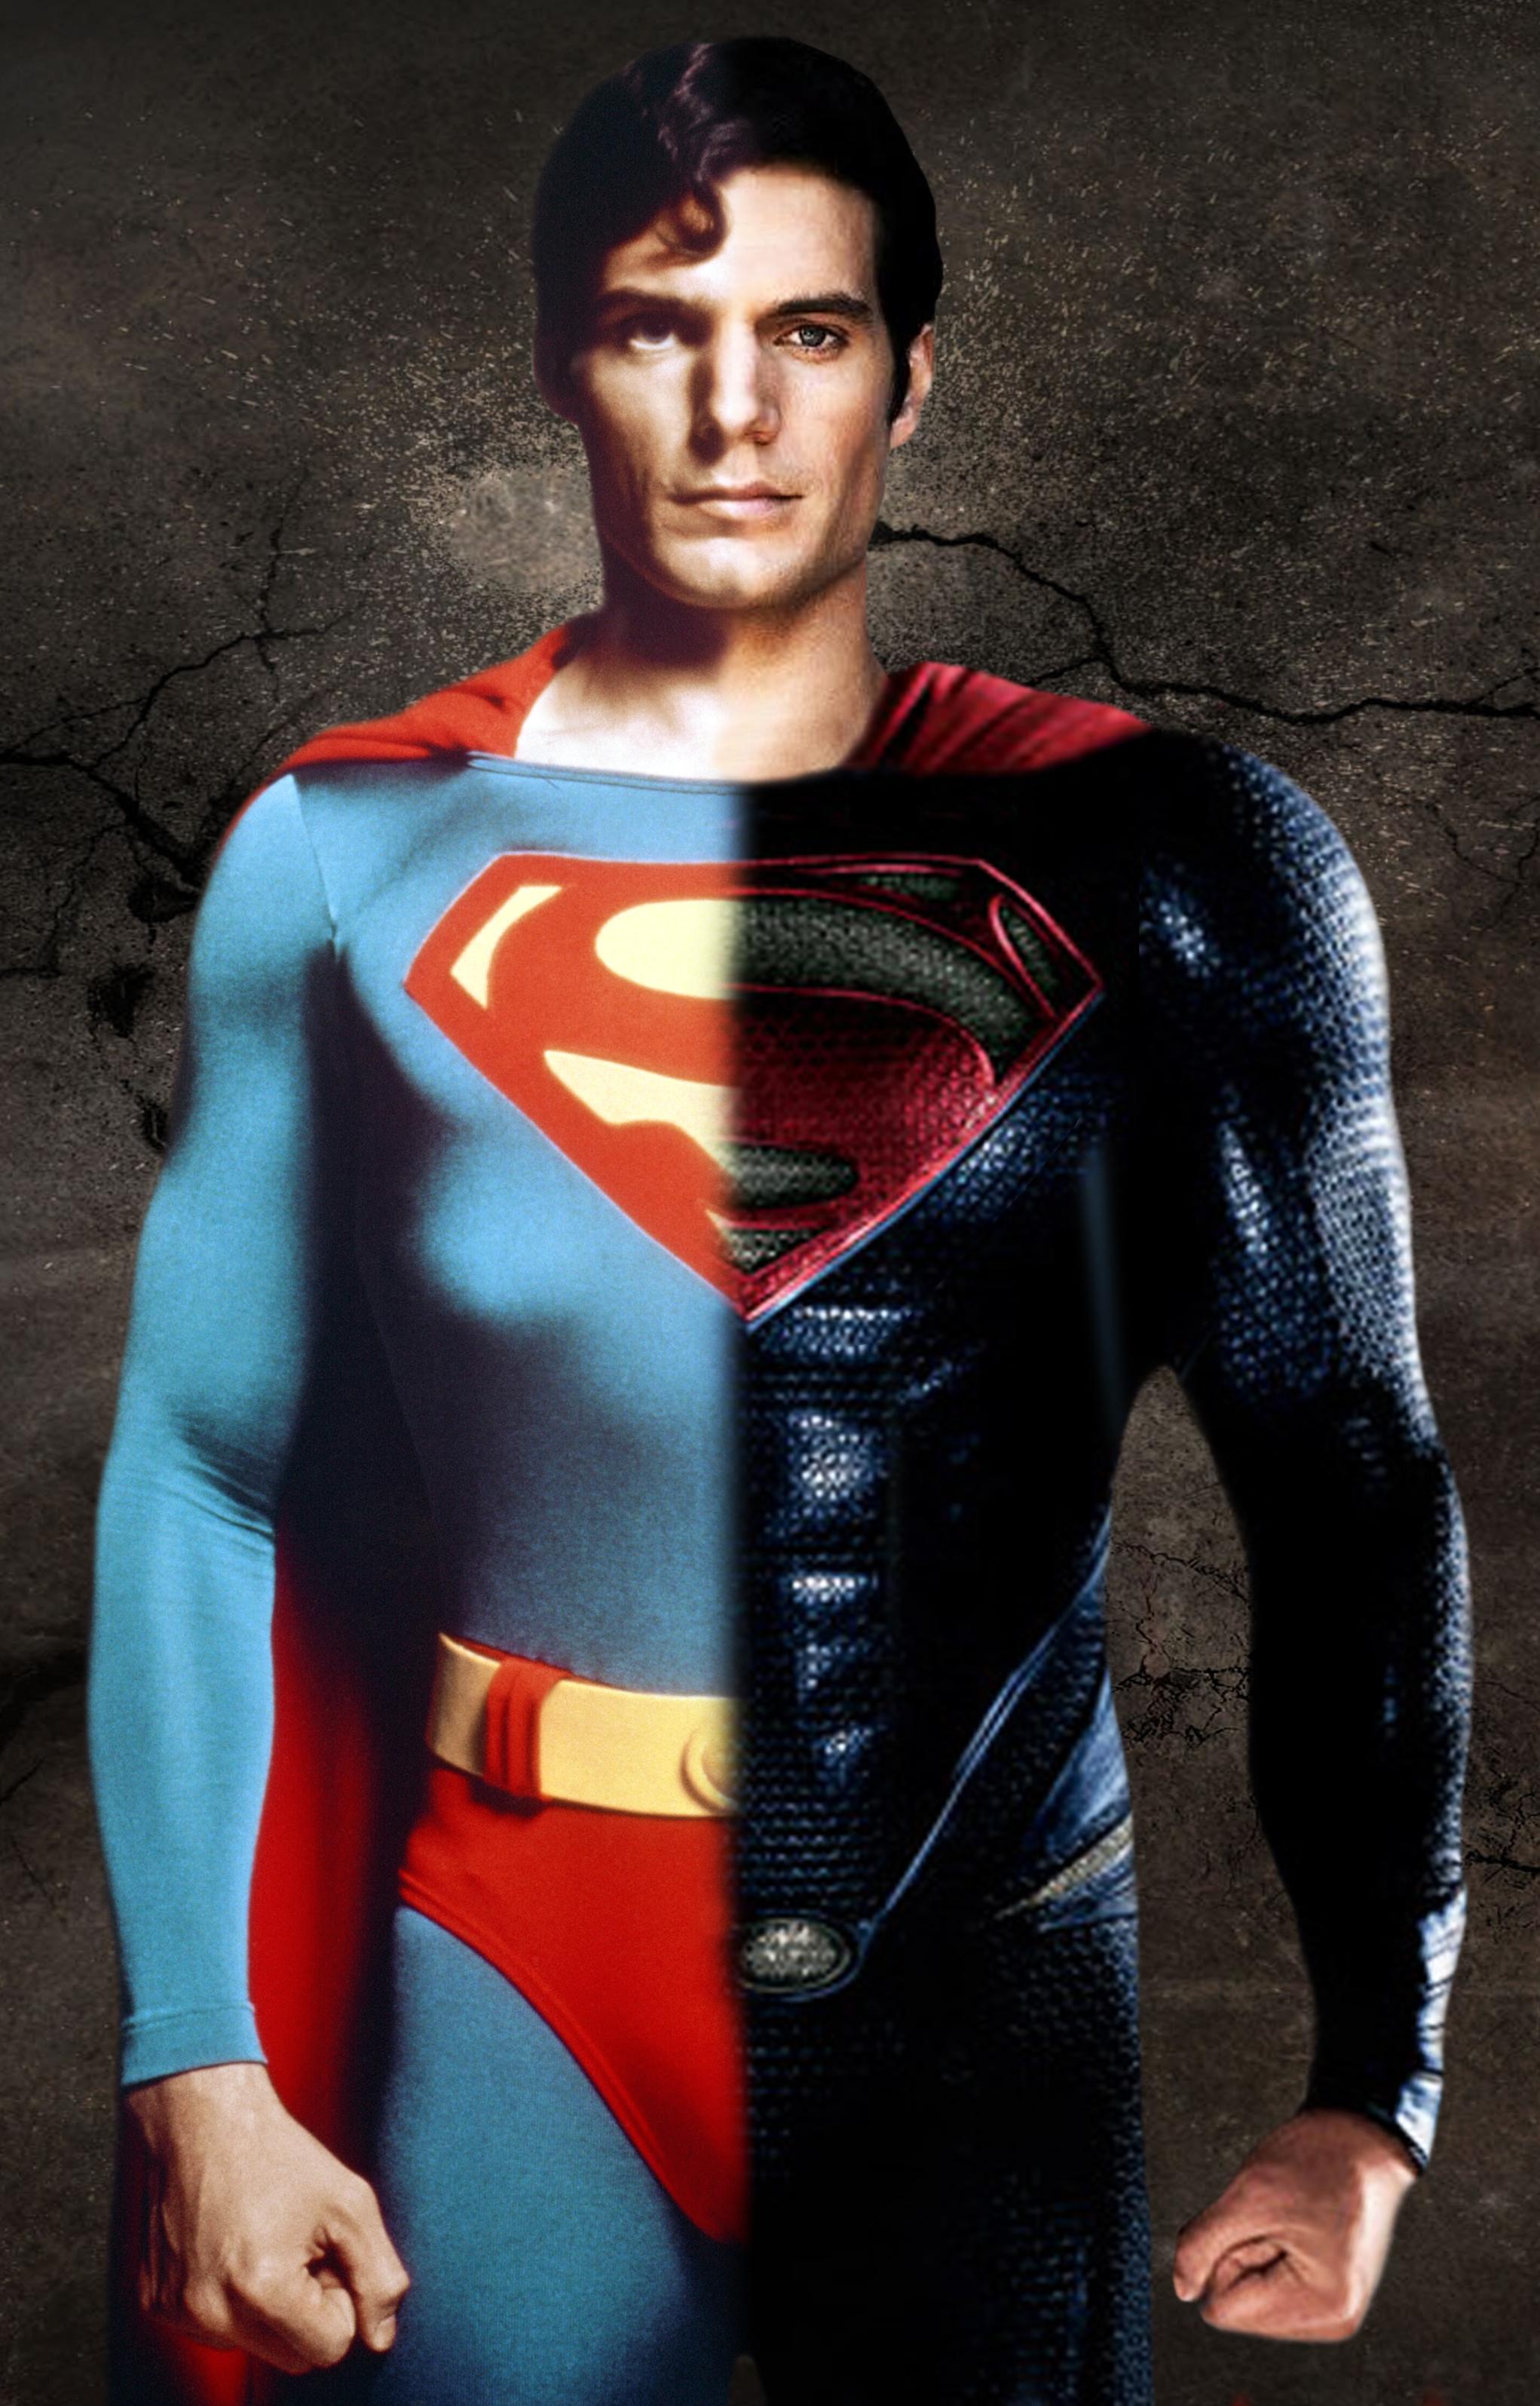 Christopher Reeve Henry Cavill By Andrewmjbaker Dfcz 2043x3191